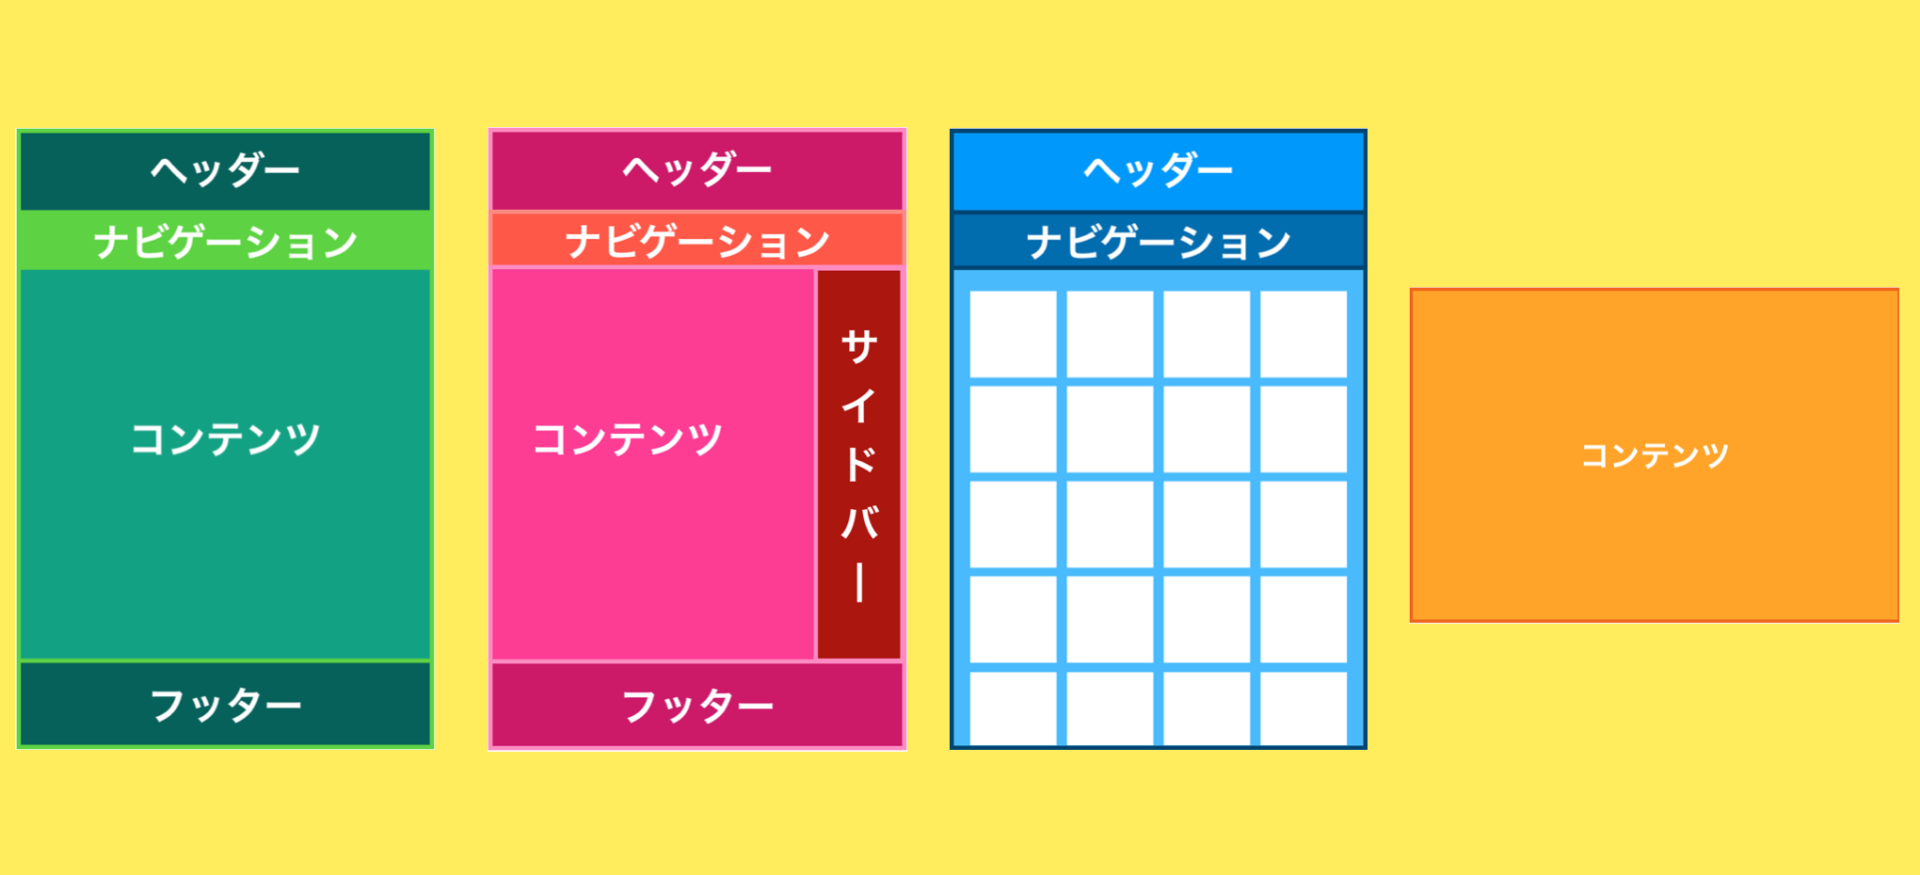 WEBページの定番・基本レイアウト「4種」の例